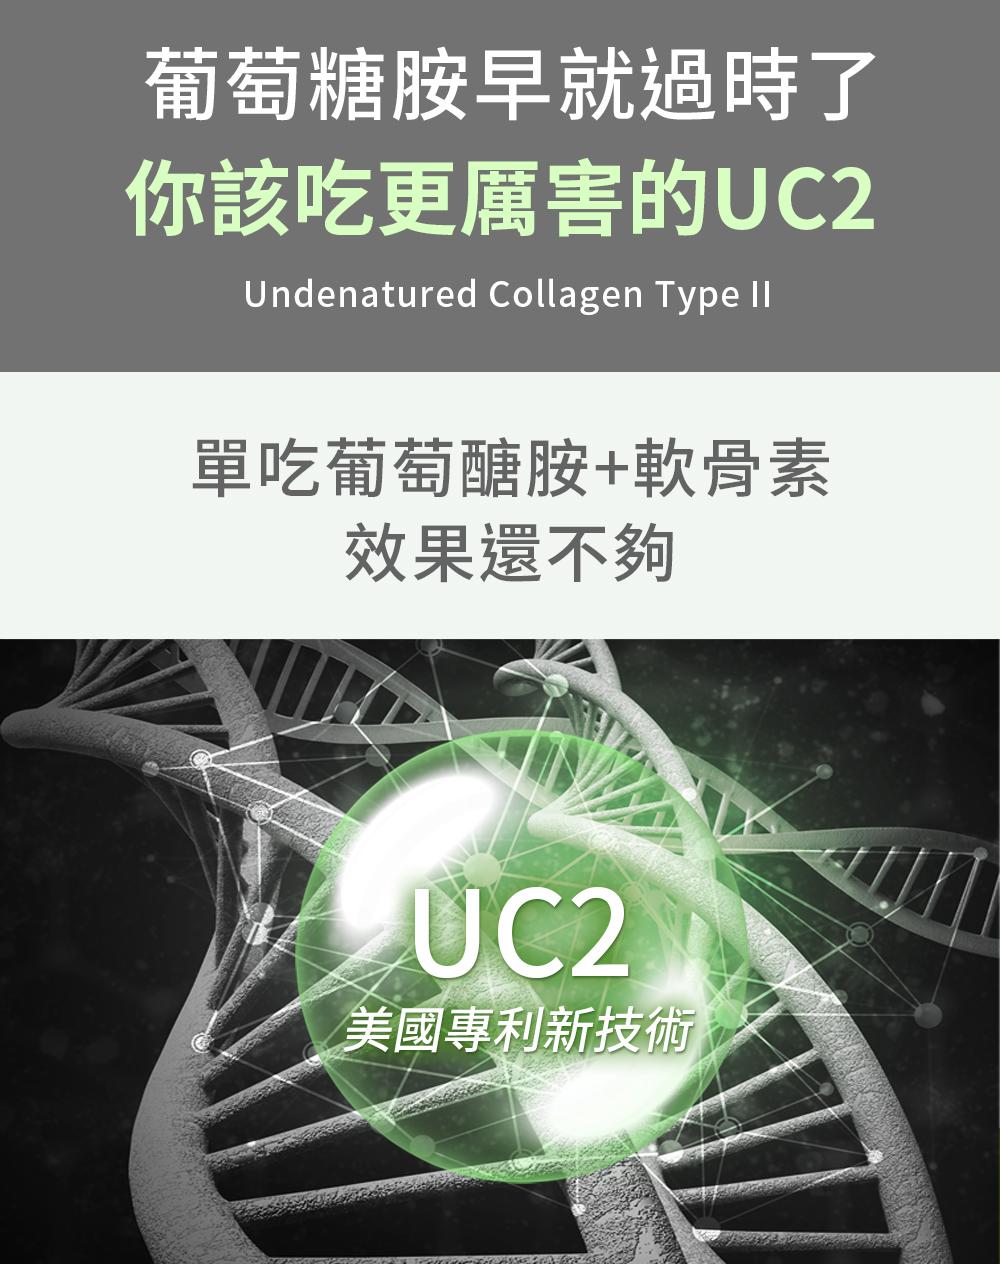 UC2活力步行非變性2型膠原蛋白-單吃葡萄醣胺+軟骨素還不夠